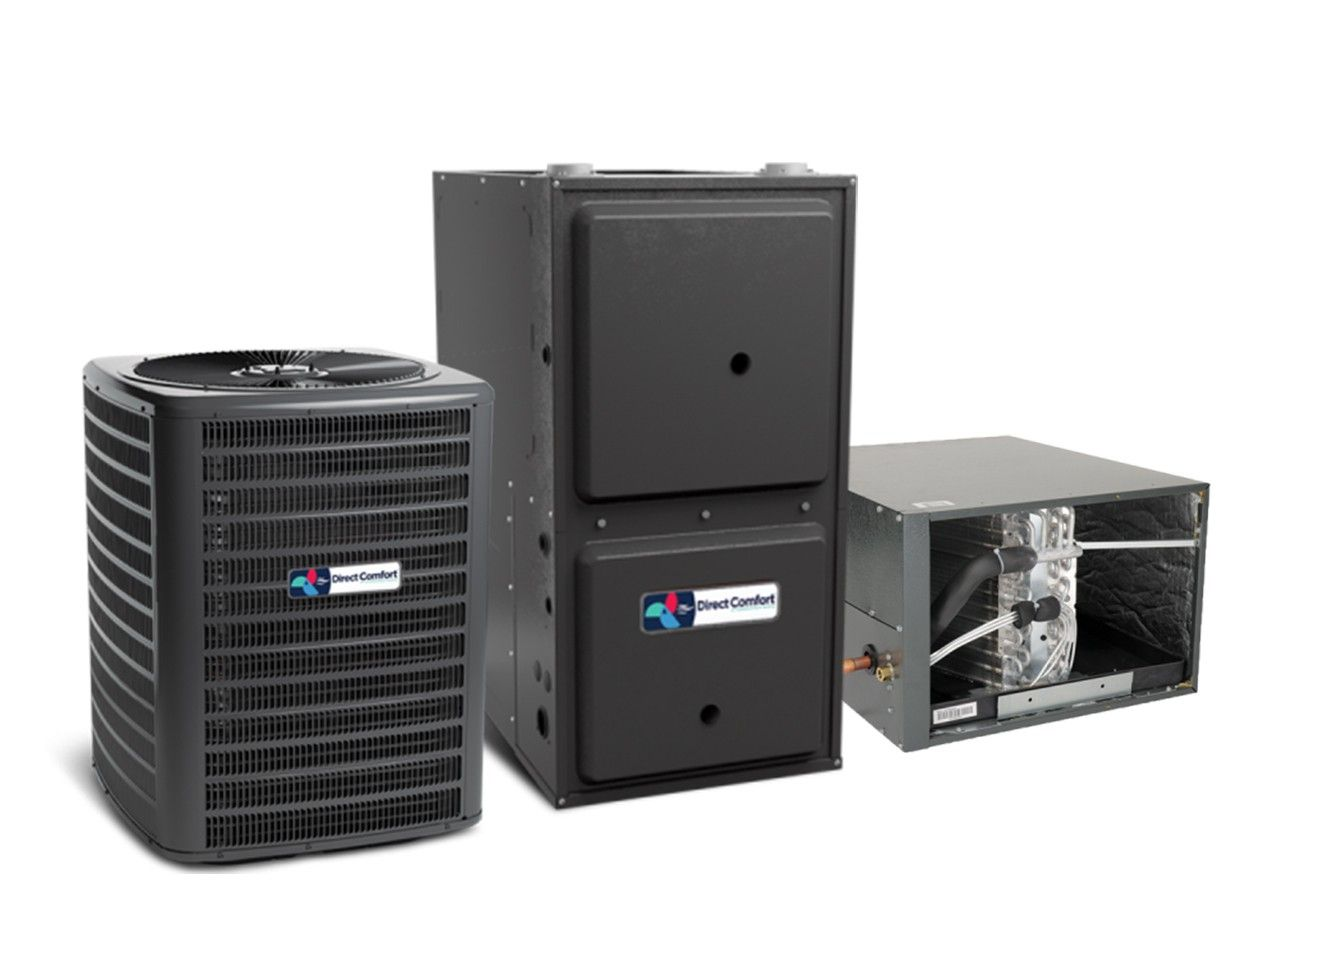 Direct Comfort 5.0 Ton 14 SEER 100K BTU 96% Single Stage Natural Gas System Upflow